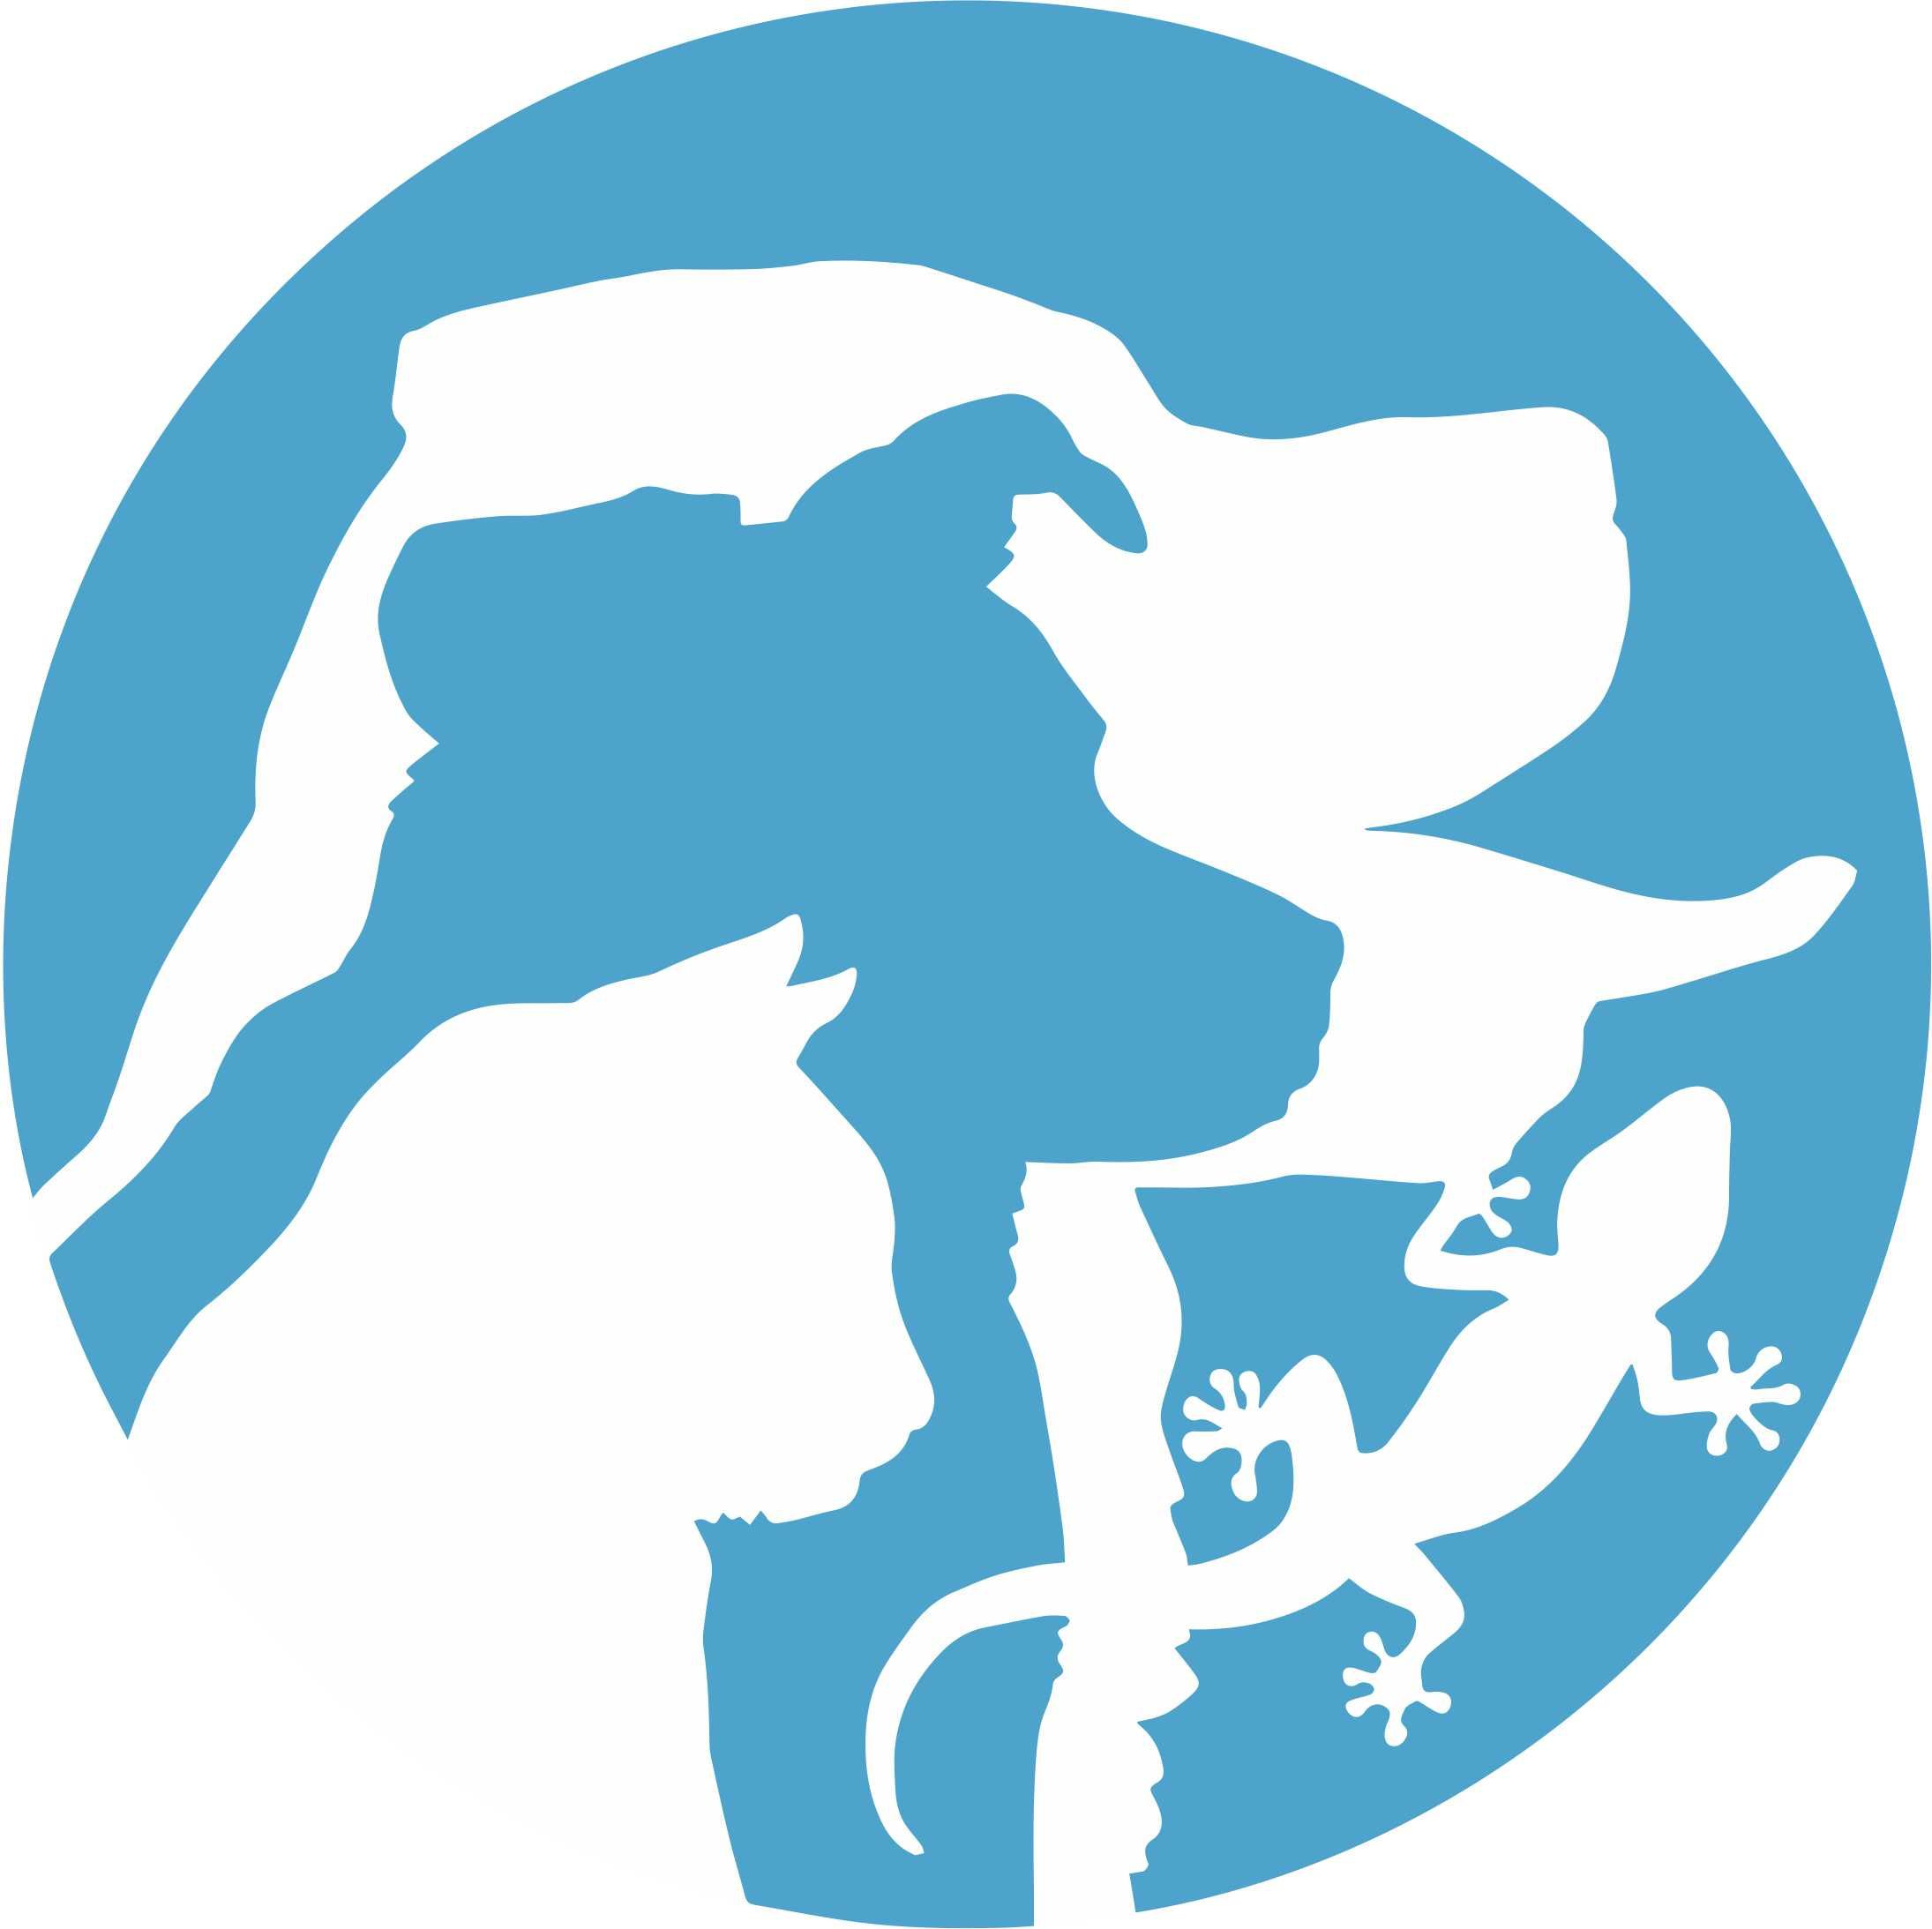 Skywolf Pet Services- Philip Mead